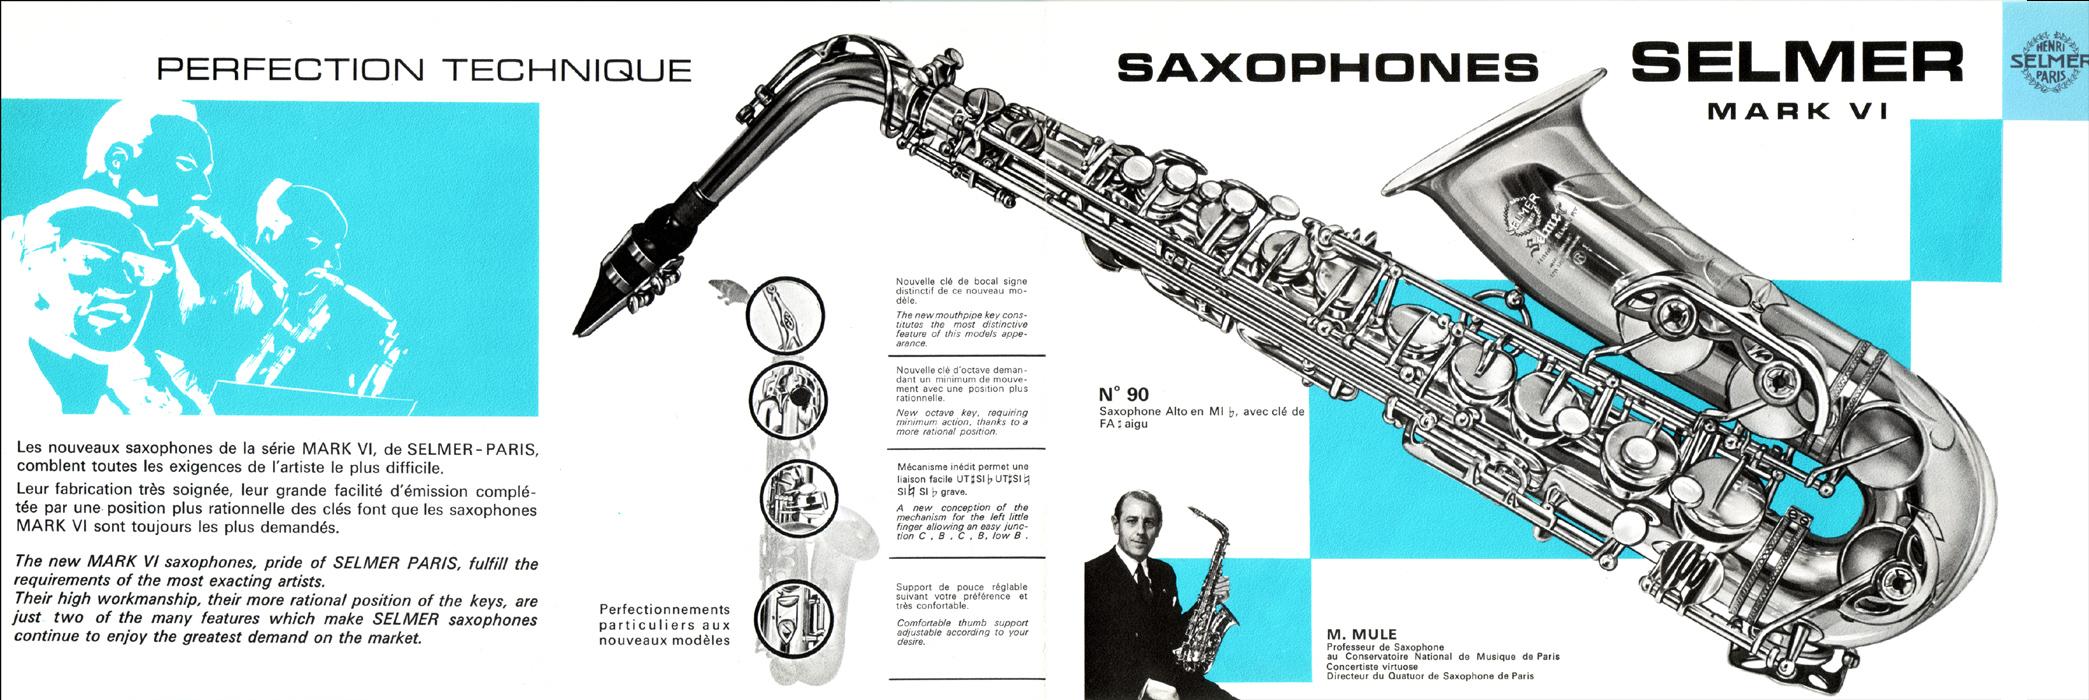 1967 A